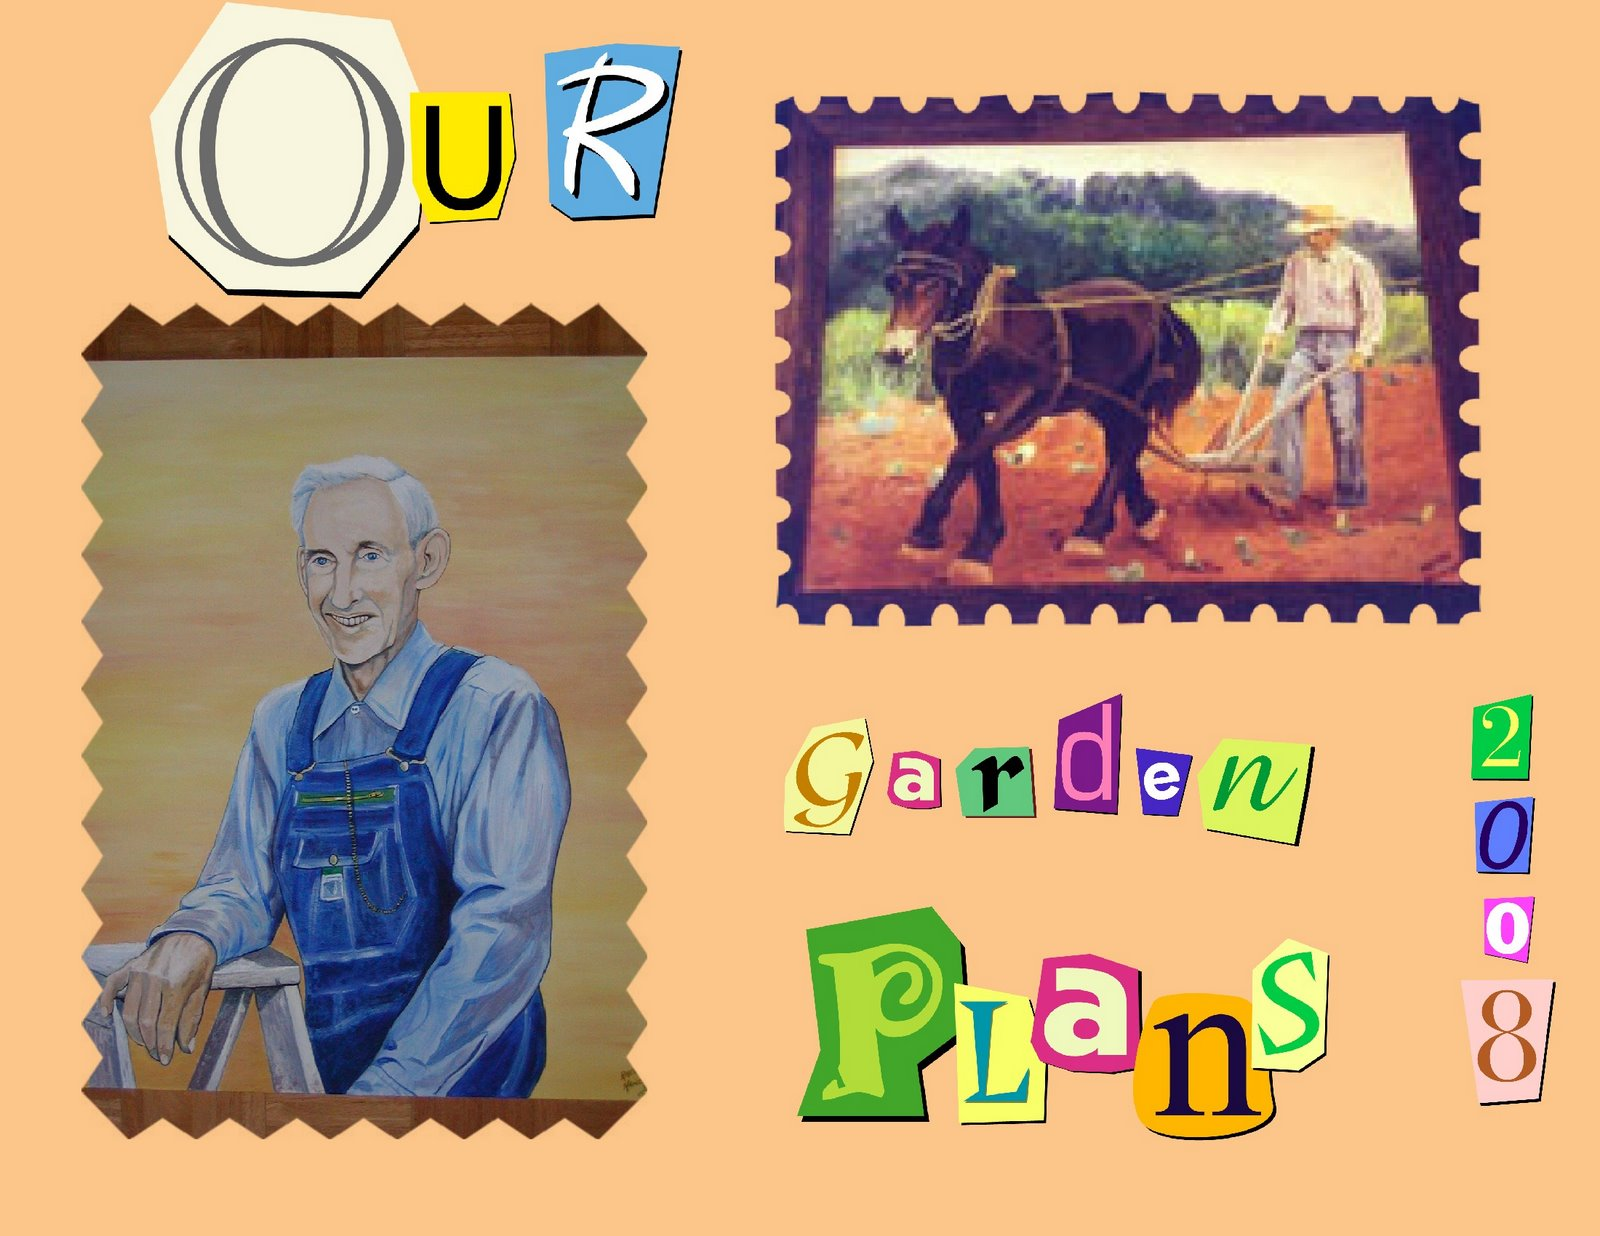 [GardeningPlans2008.JPG]